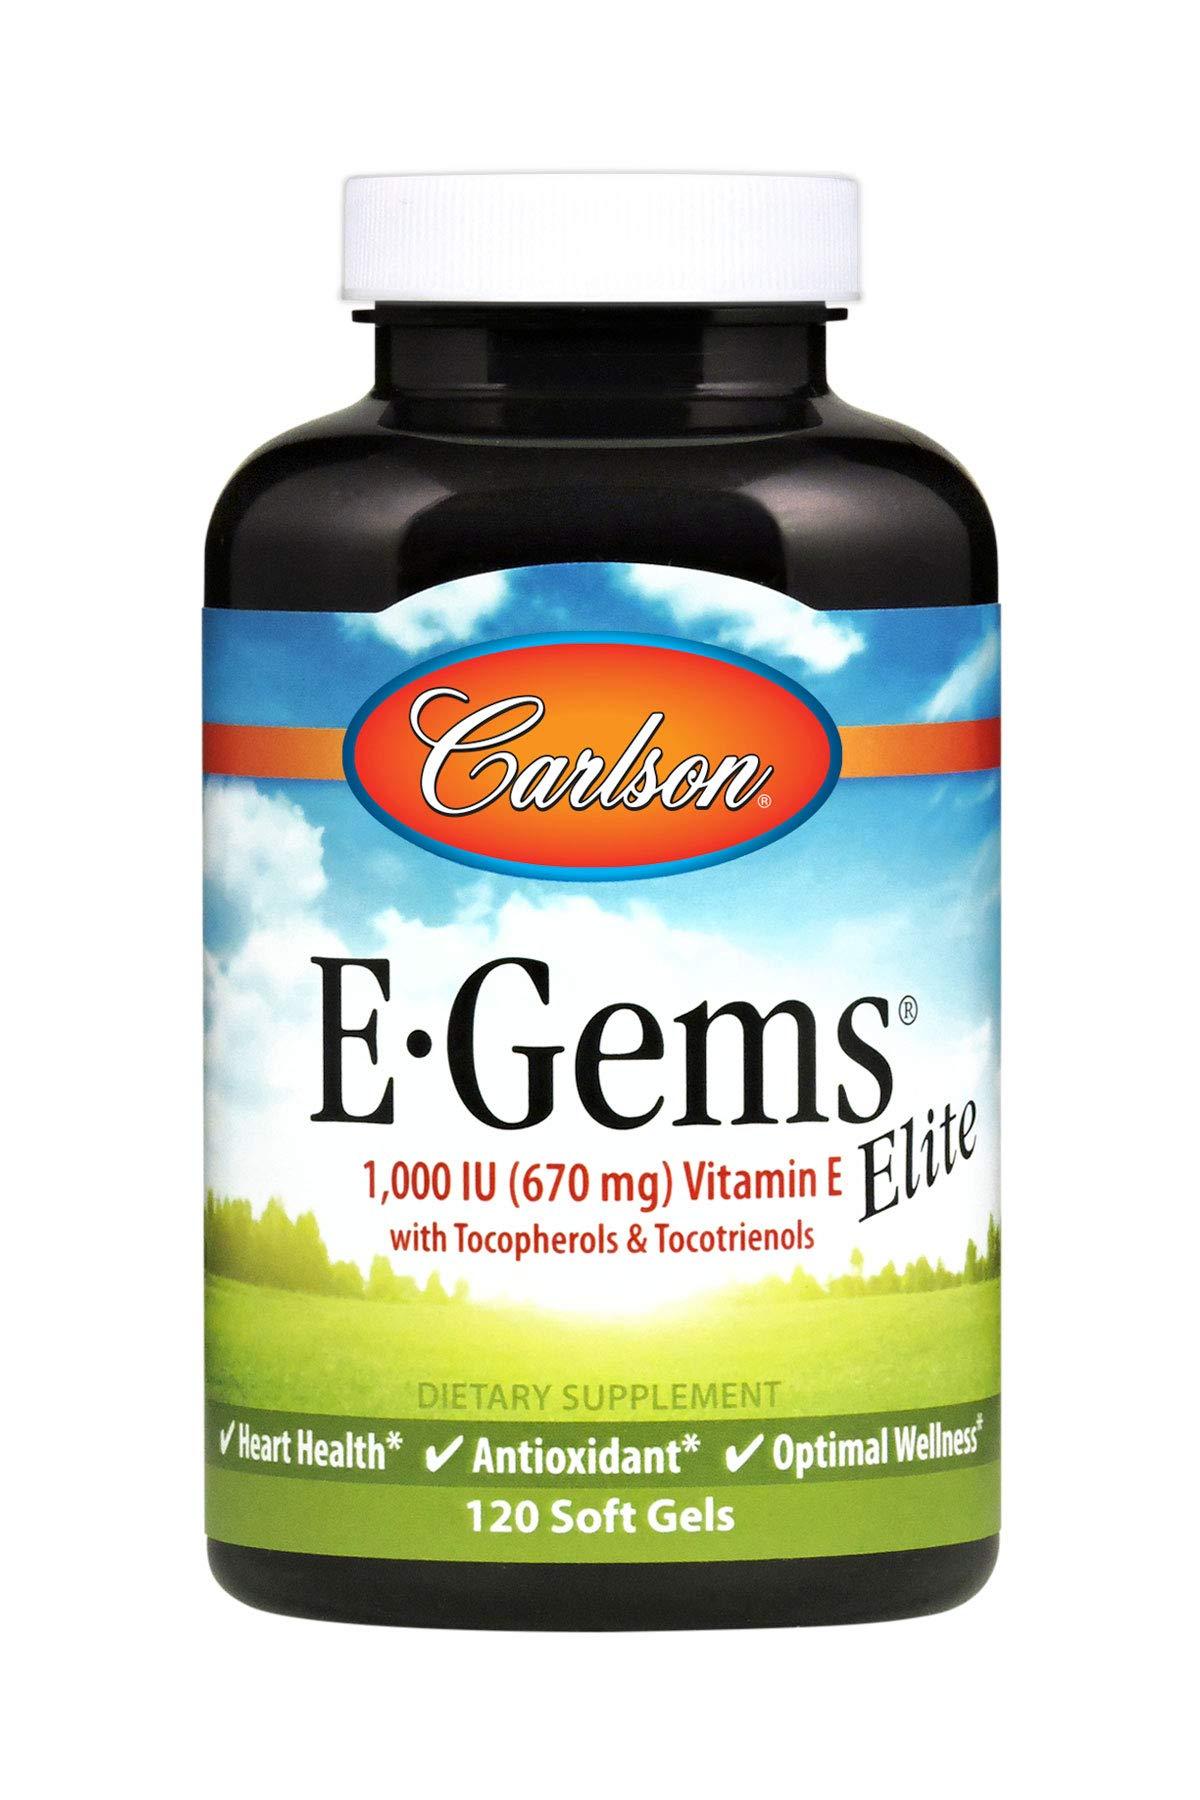 Carlson - E-Gems Elite, 1000 IU Vitamin E with Tocopherols & Tocotrienols, Heart Health & Optimal Wellness, Antioxidant, 120 soft gels by Carlson